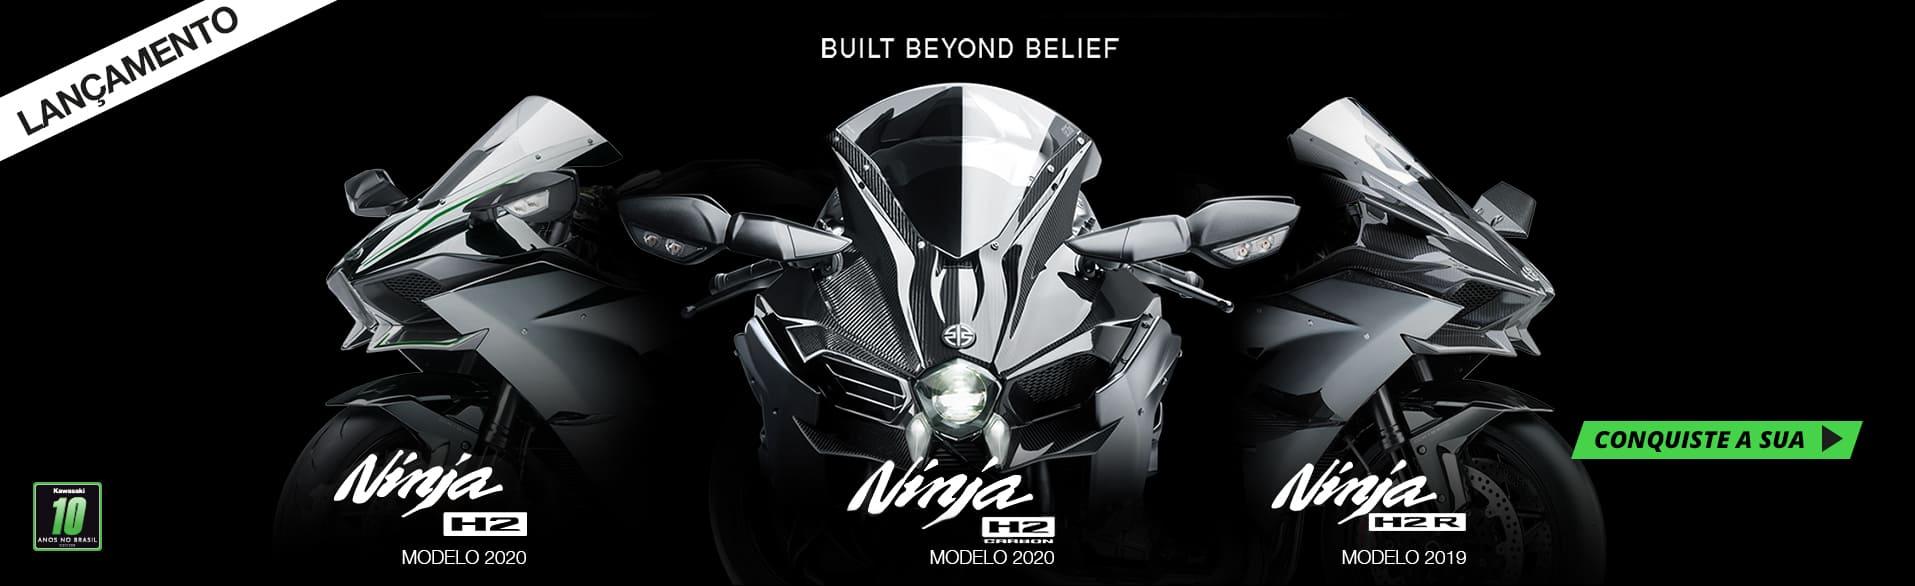 lançamento ninja h2